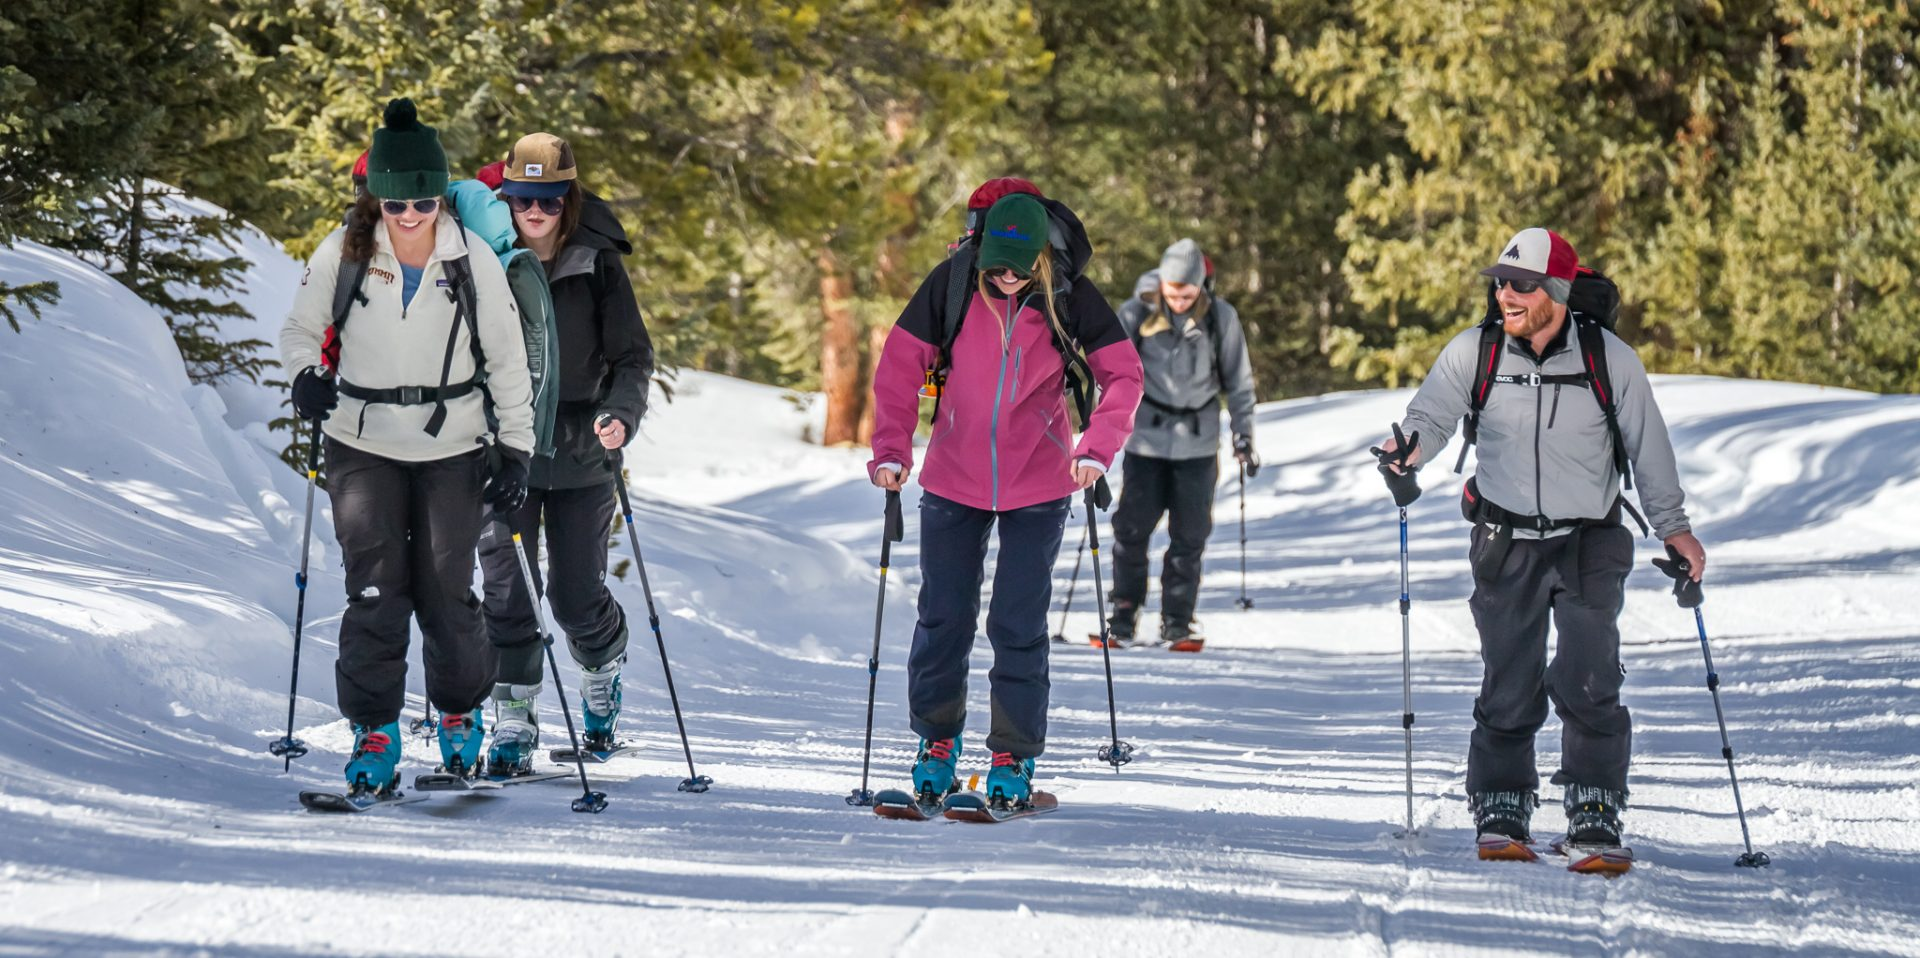 backcountry skiing 2